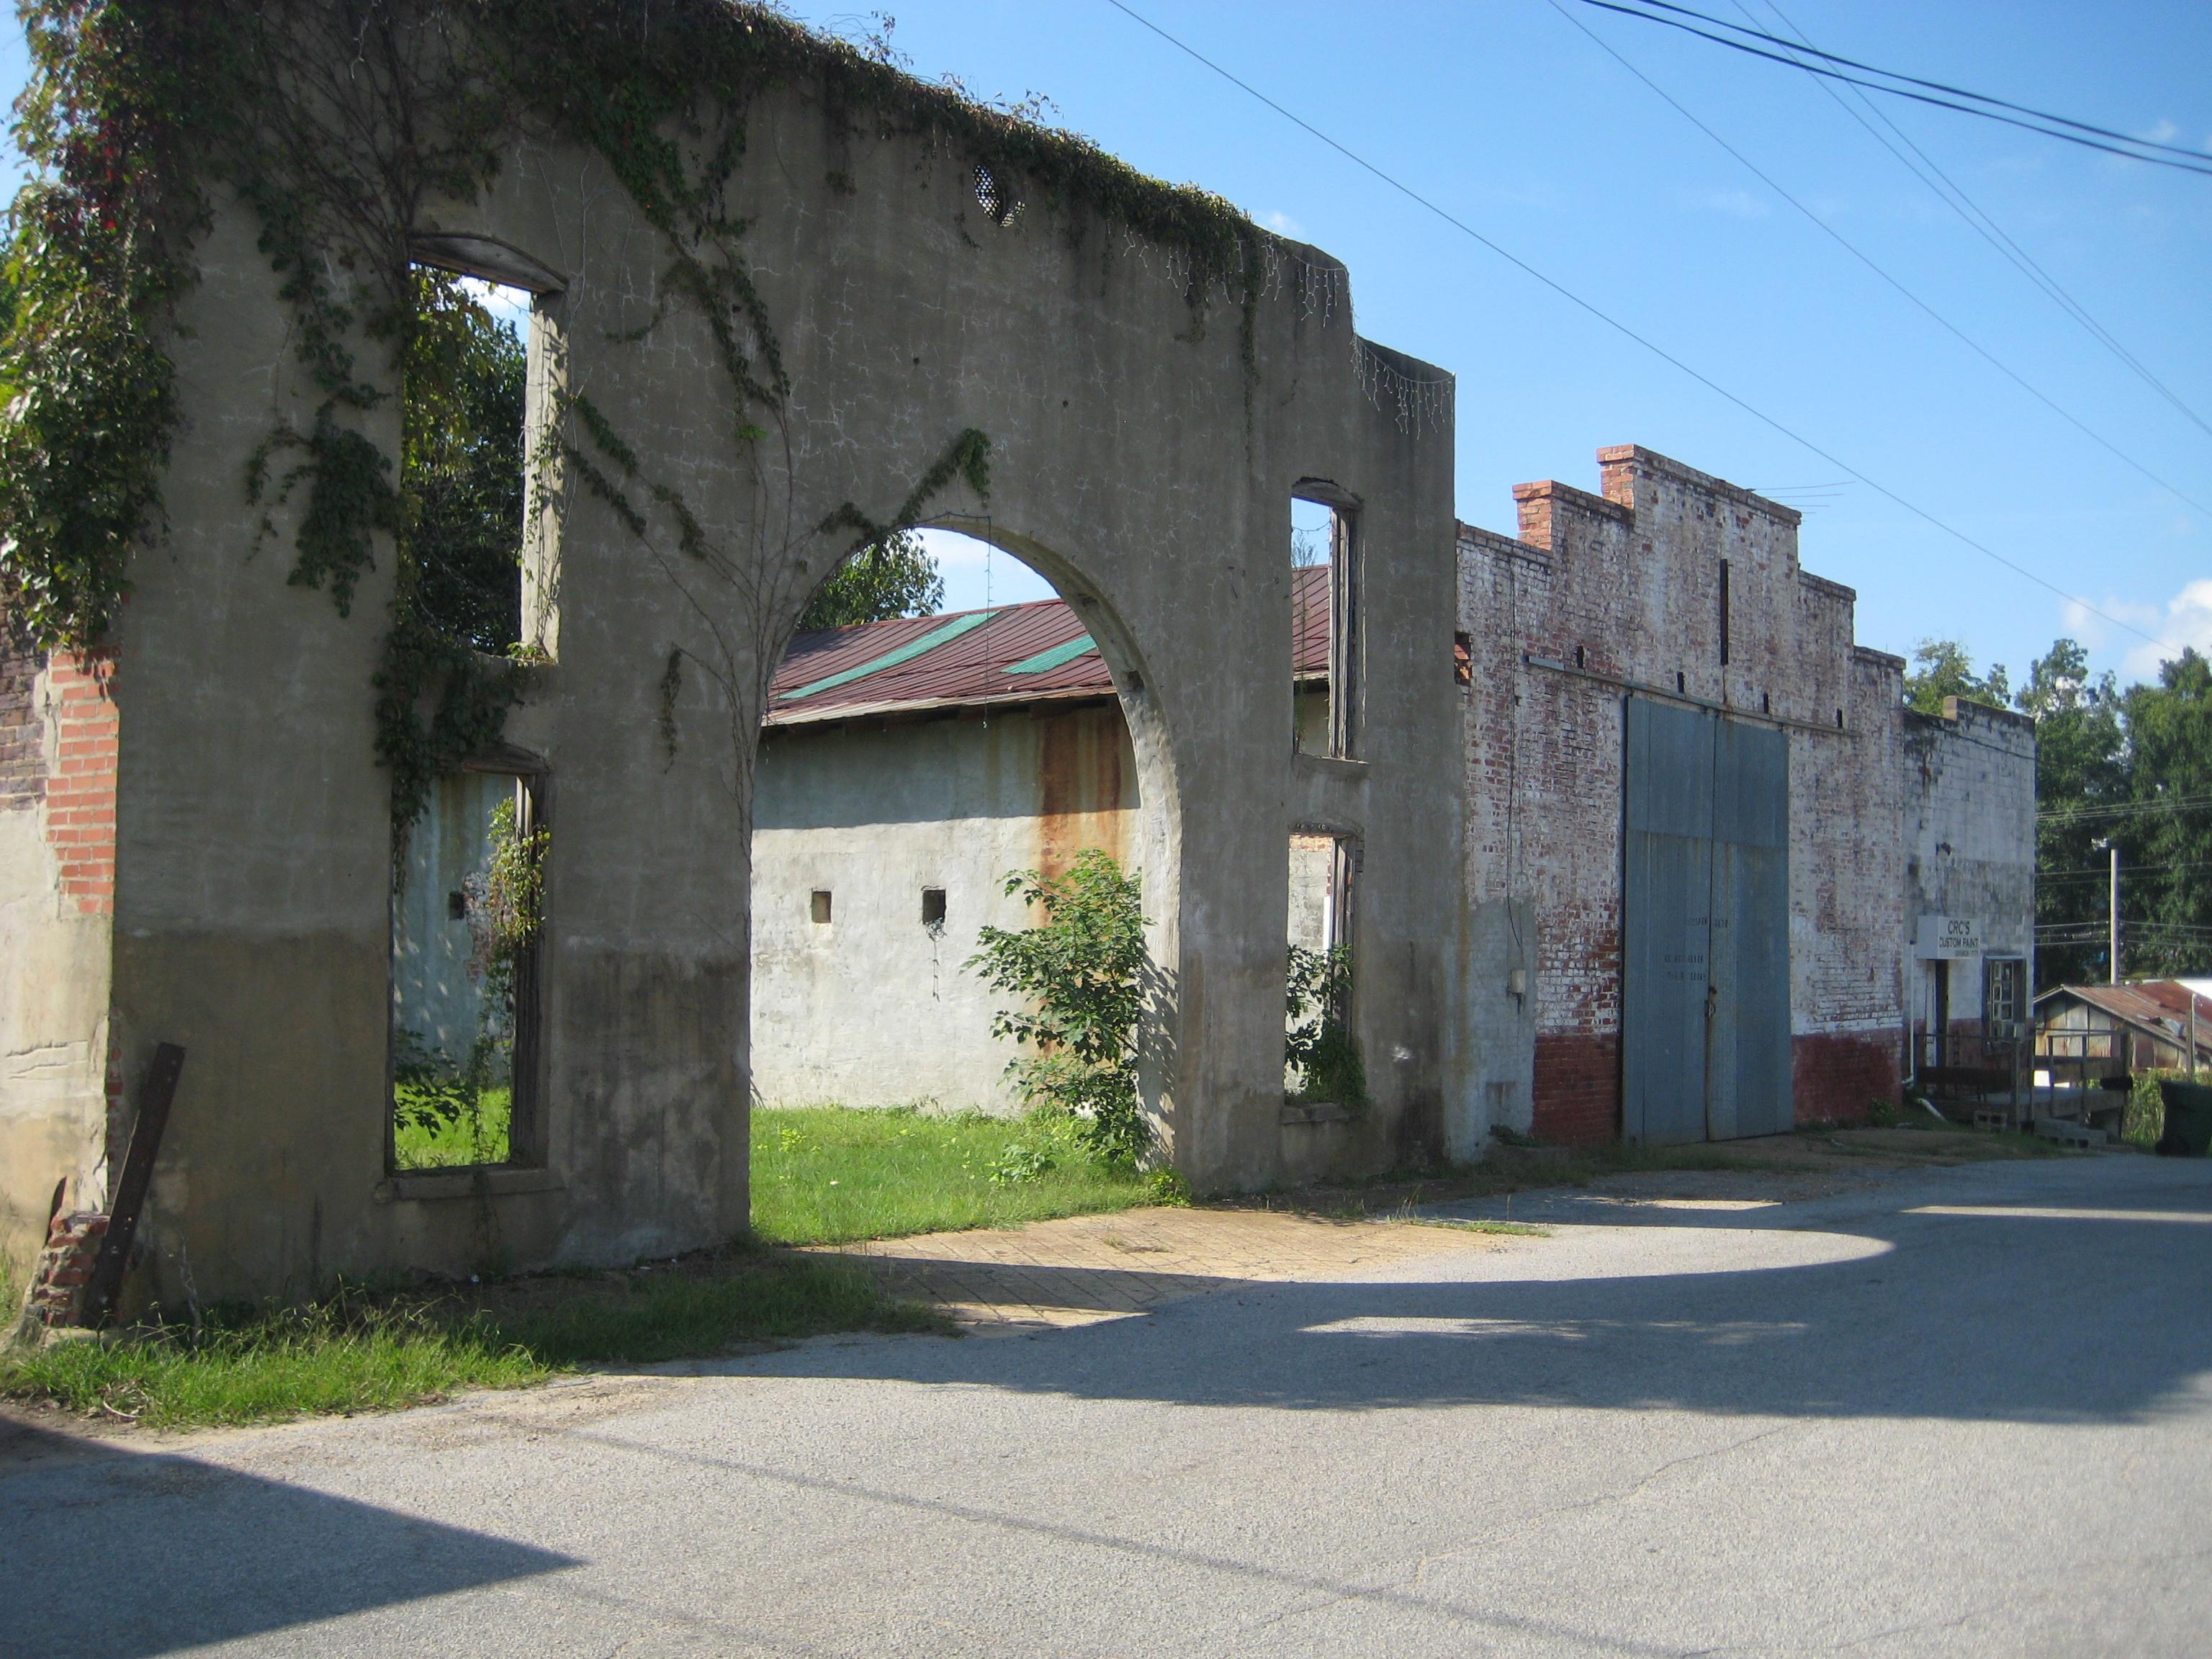 Greensboro Alabama 2009